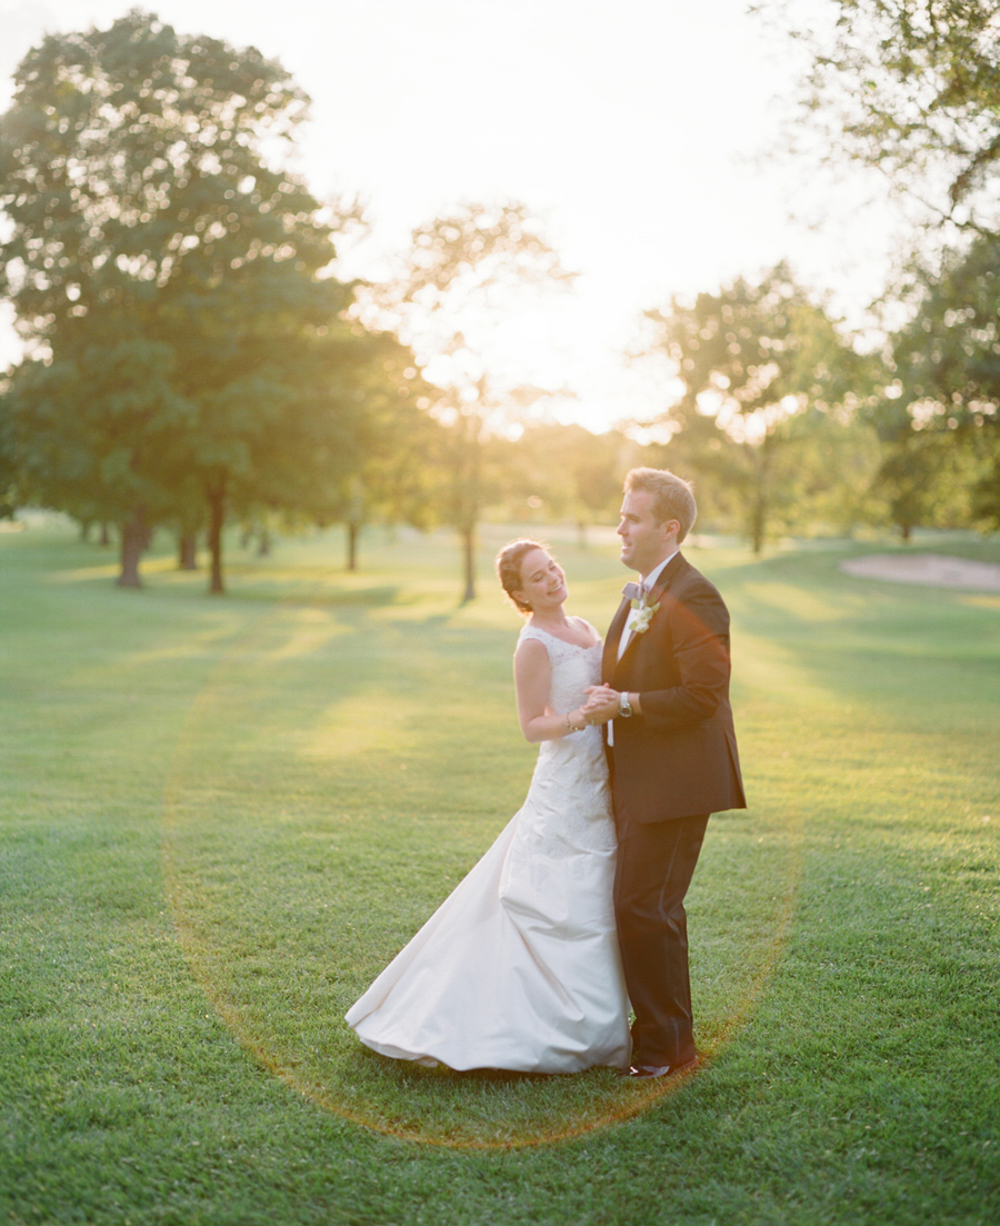 Glen_View_Club_Chicago_wedding_046.jpg